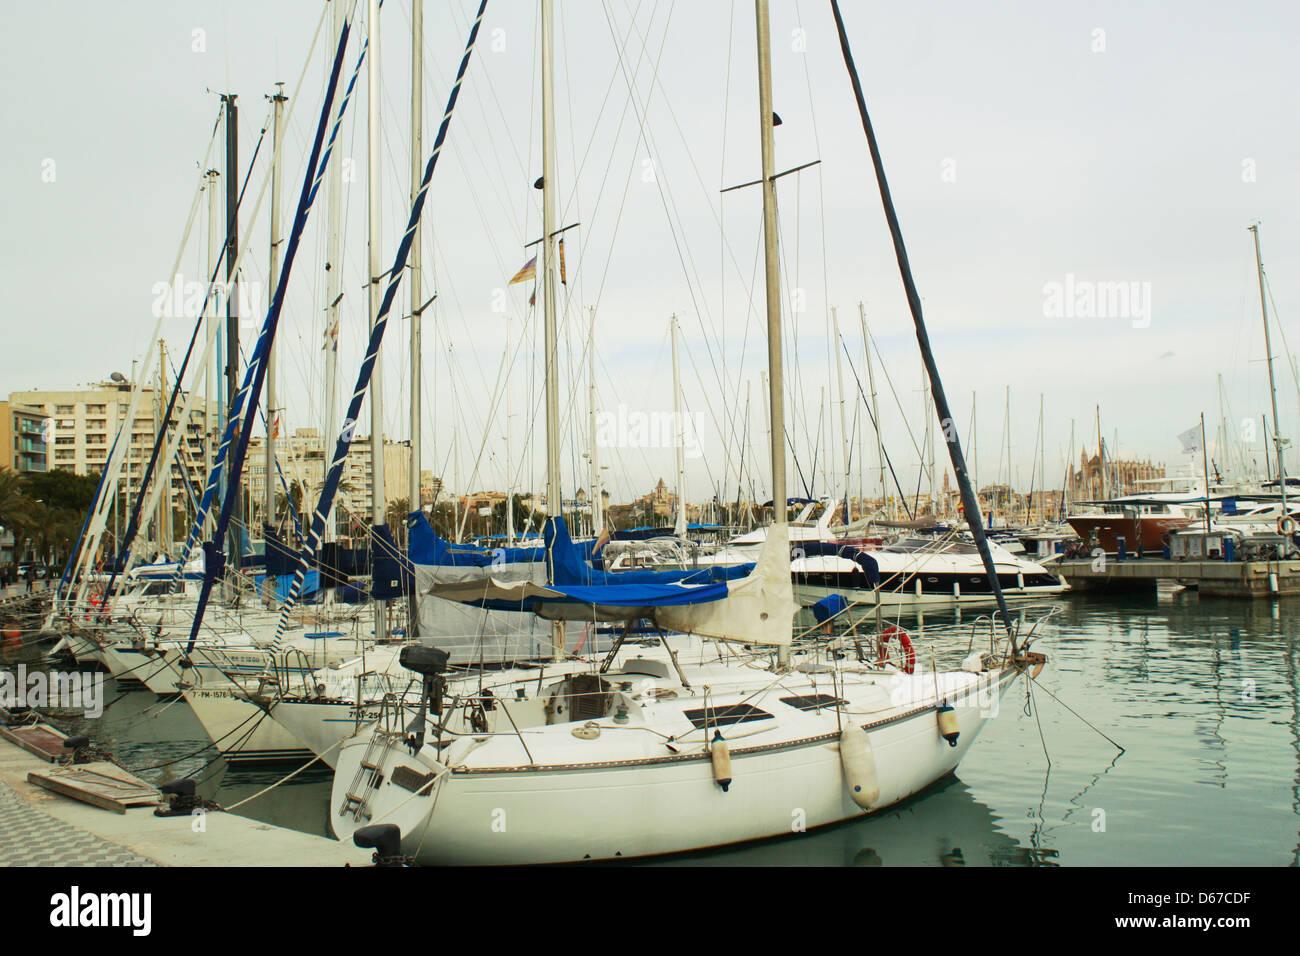 Boats in Palma De Mallorca Stock Photo